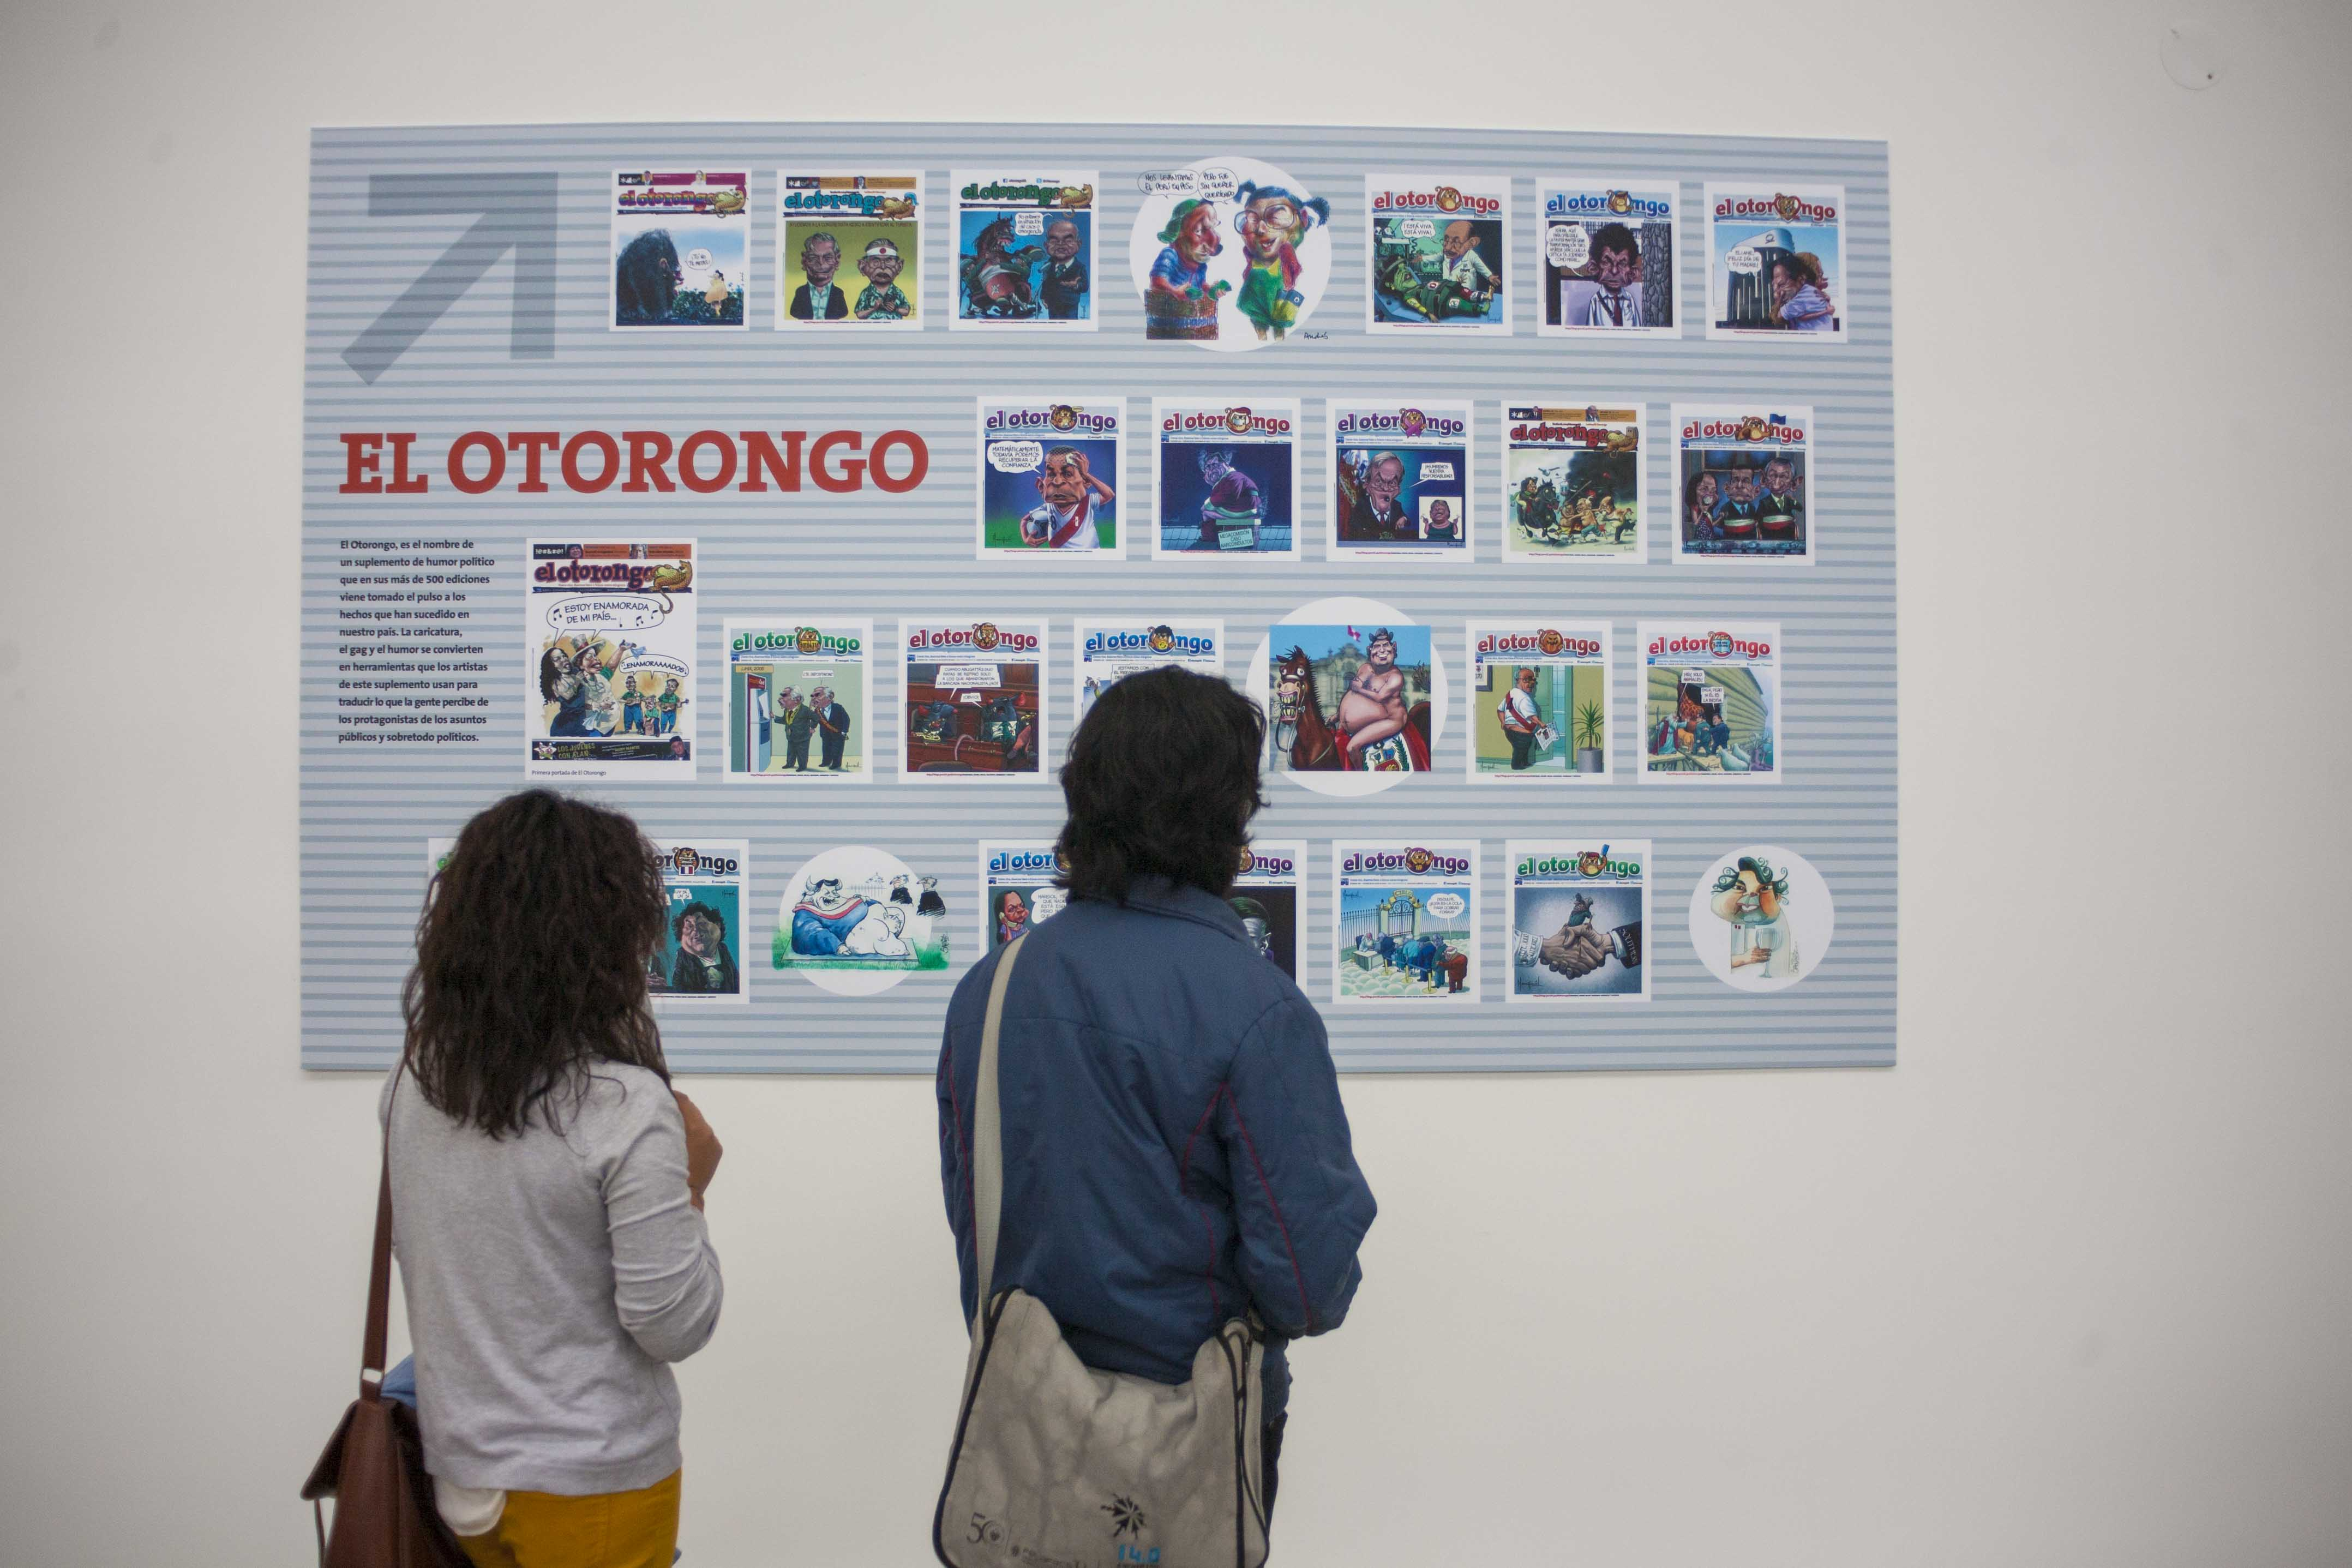 peru21 expo9